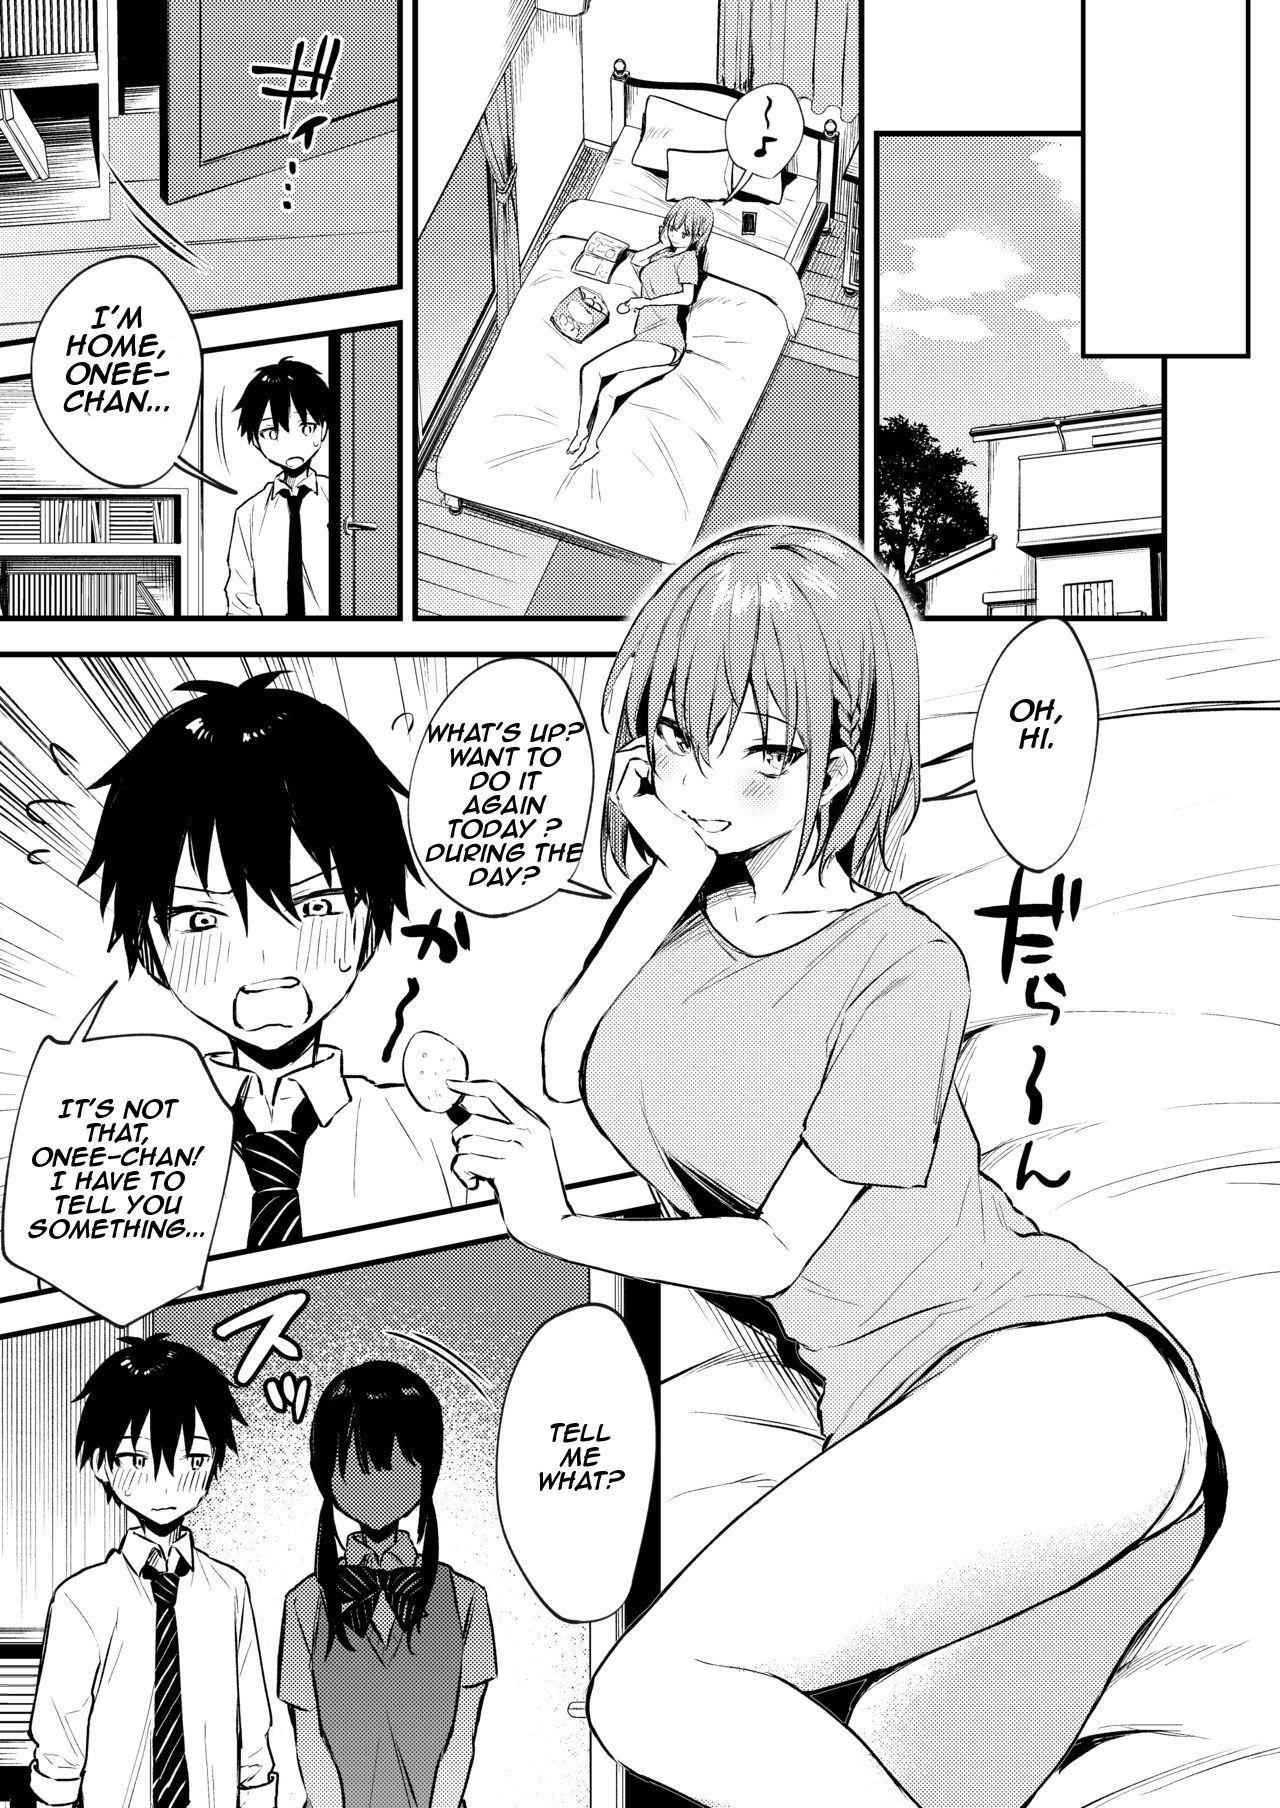 Onee-chan ga Ecchi na Koto bakka Suru kara... | My older sister only does obscene things... 8